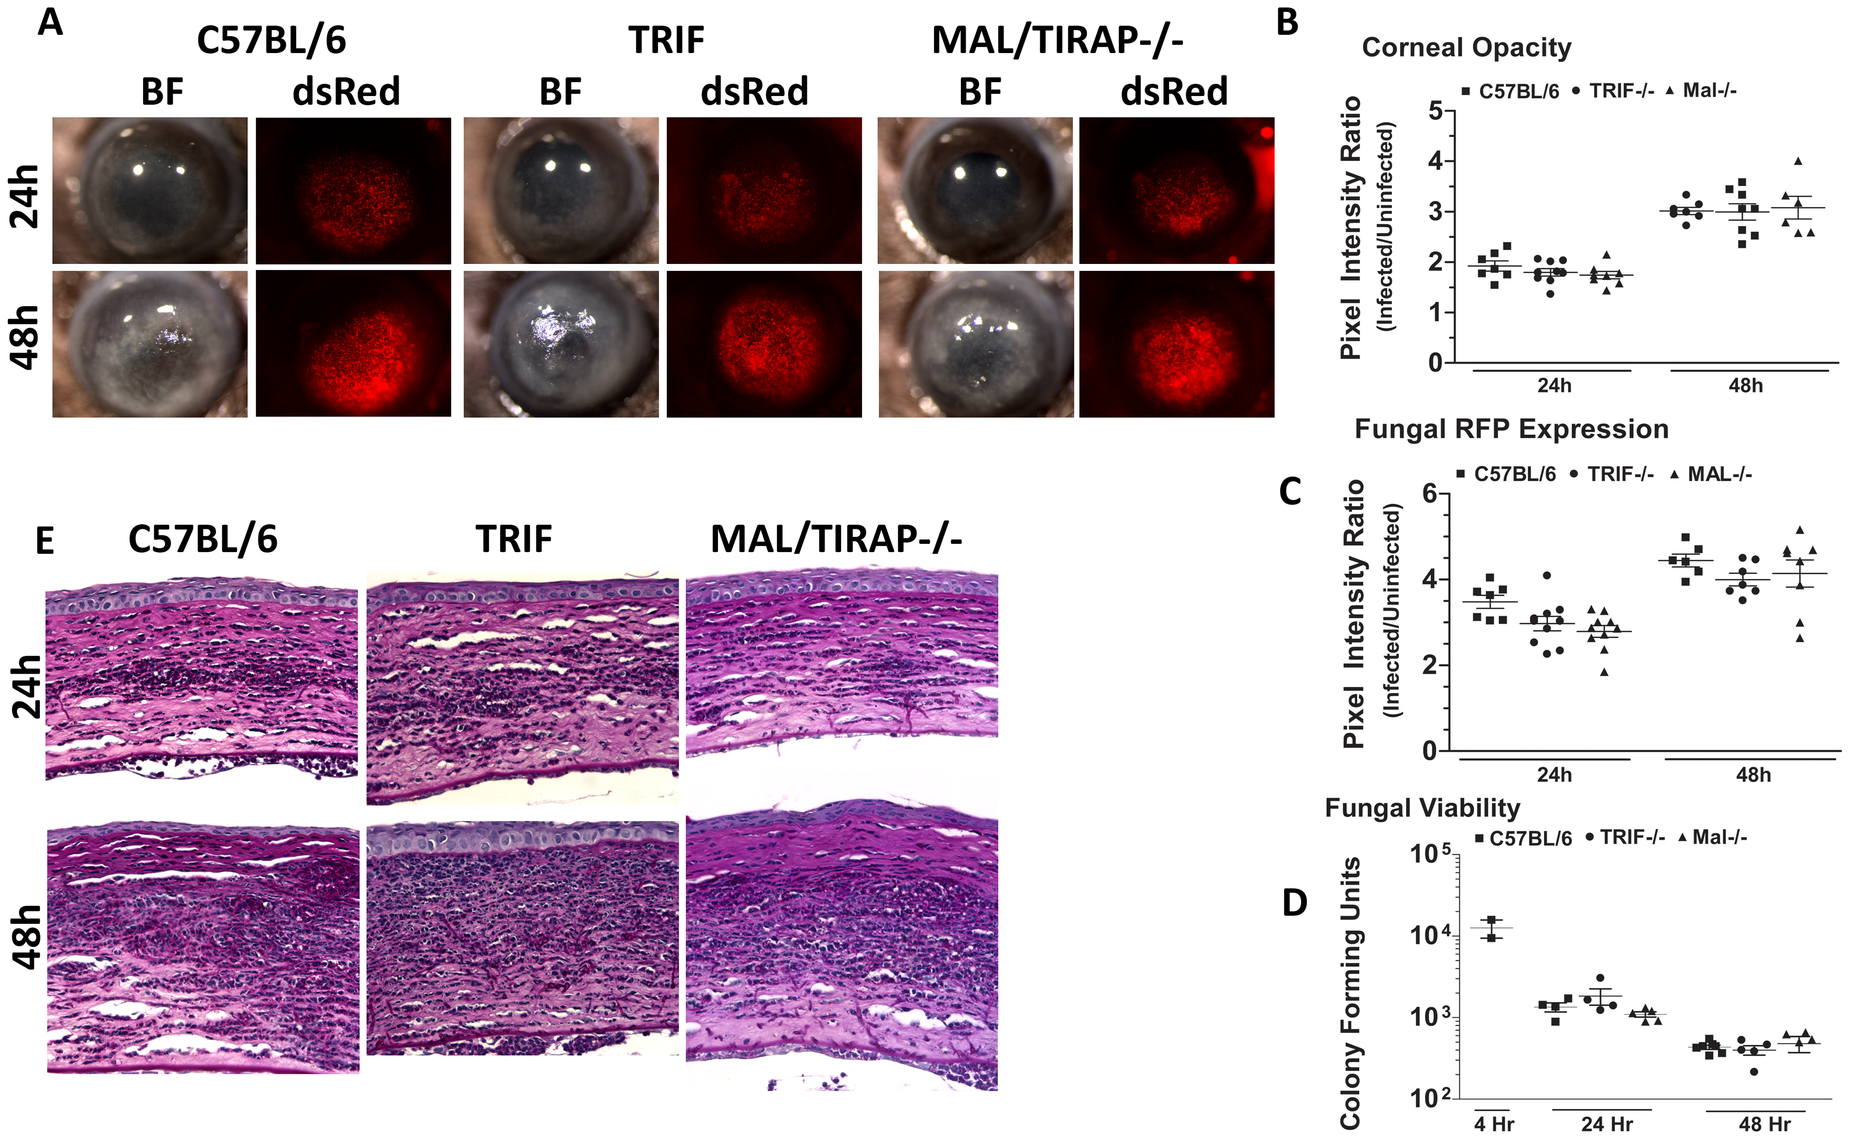 The role of TIRAP and TRIF in <i>A. fumigatus</i> keratitis.